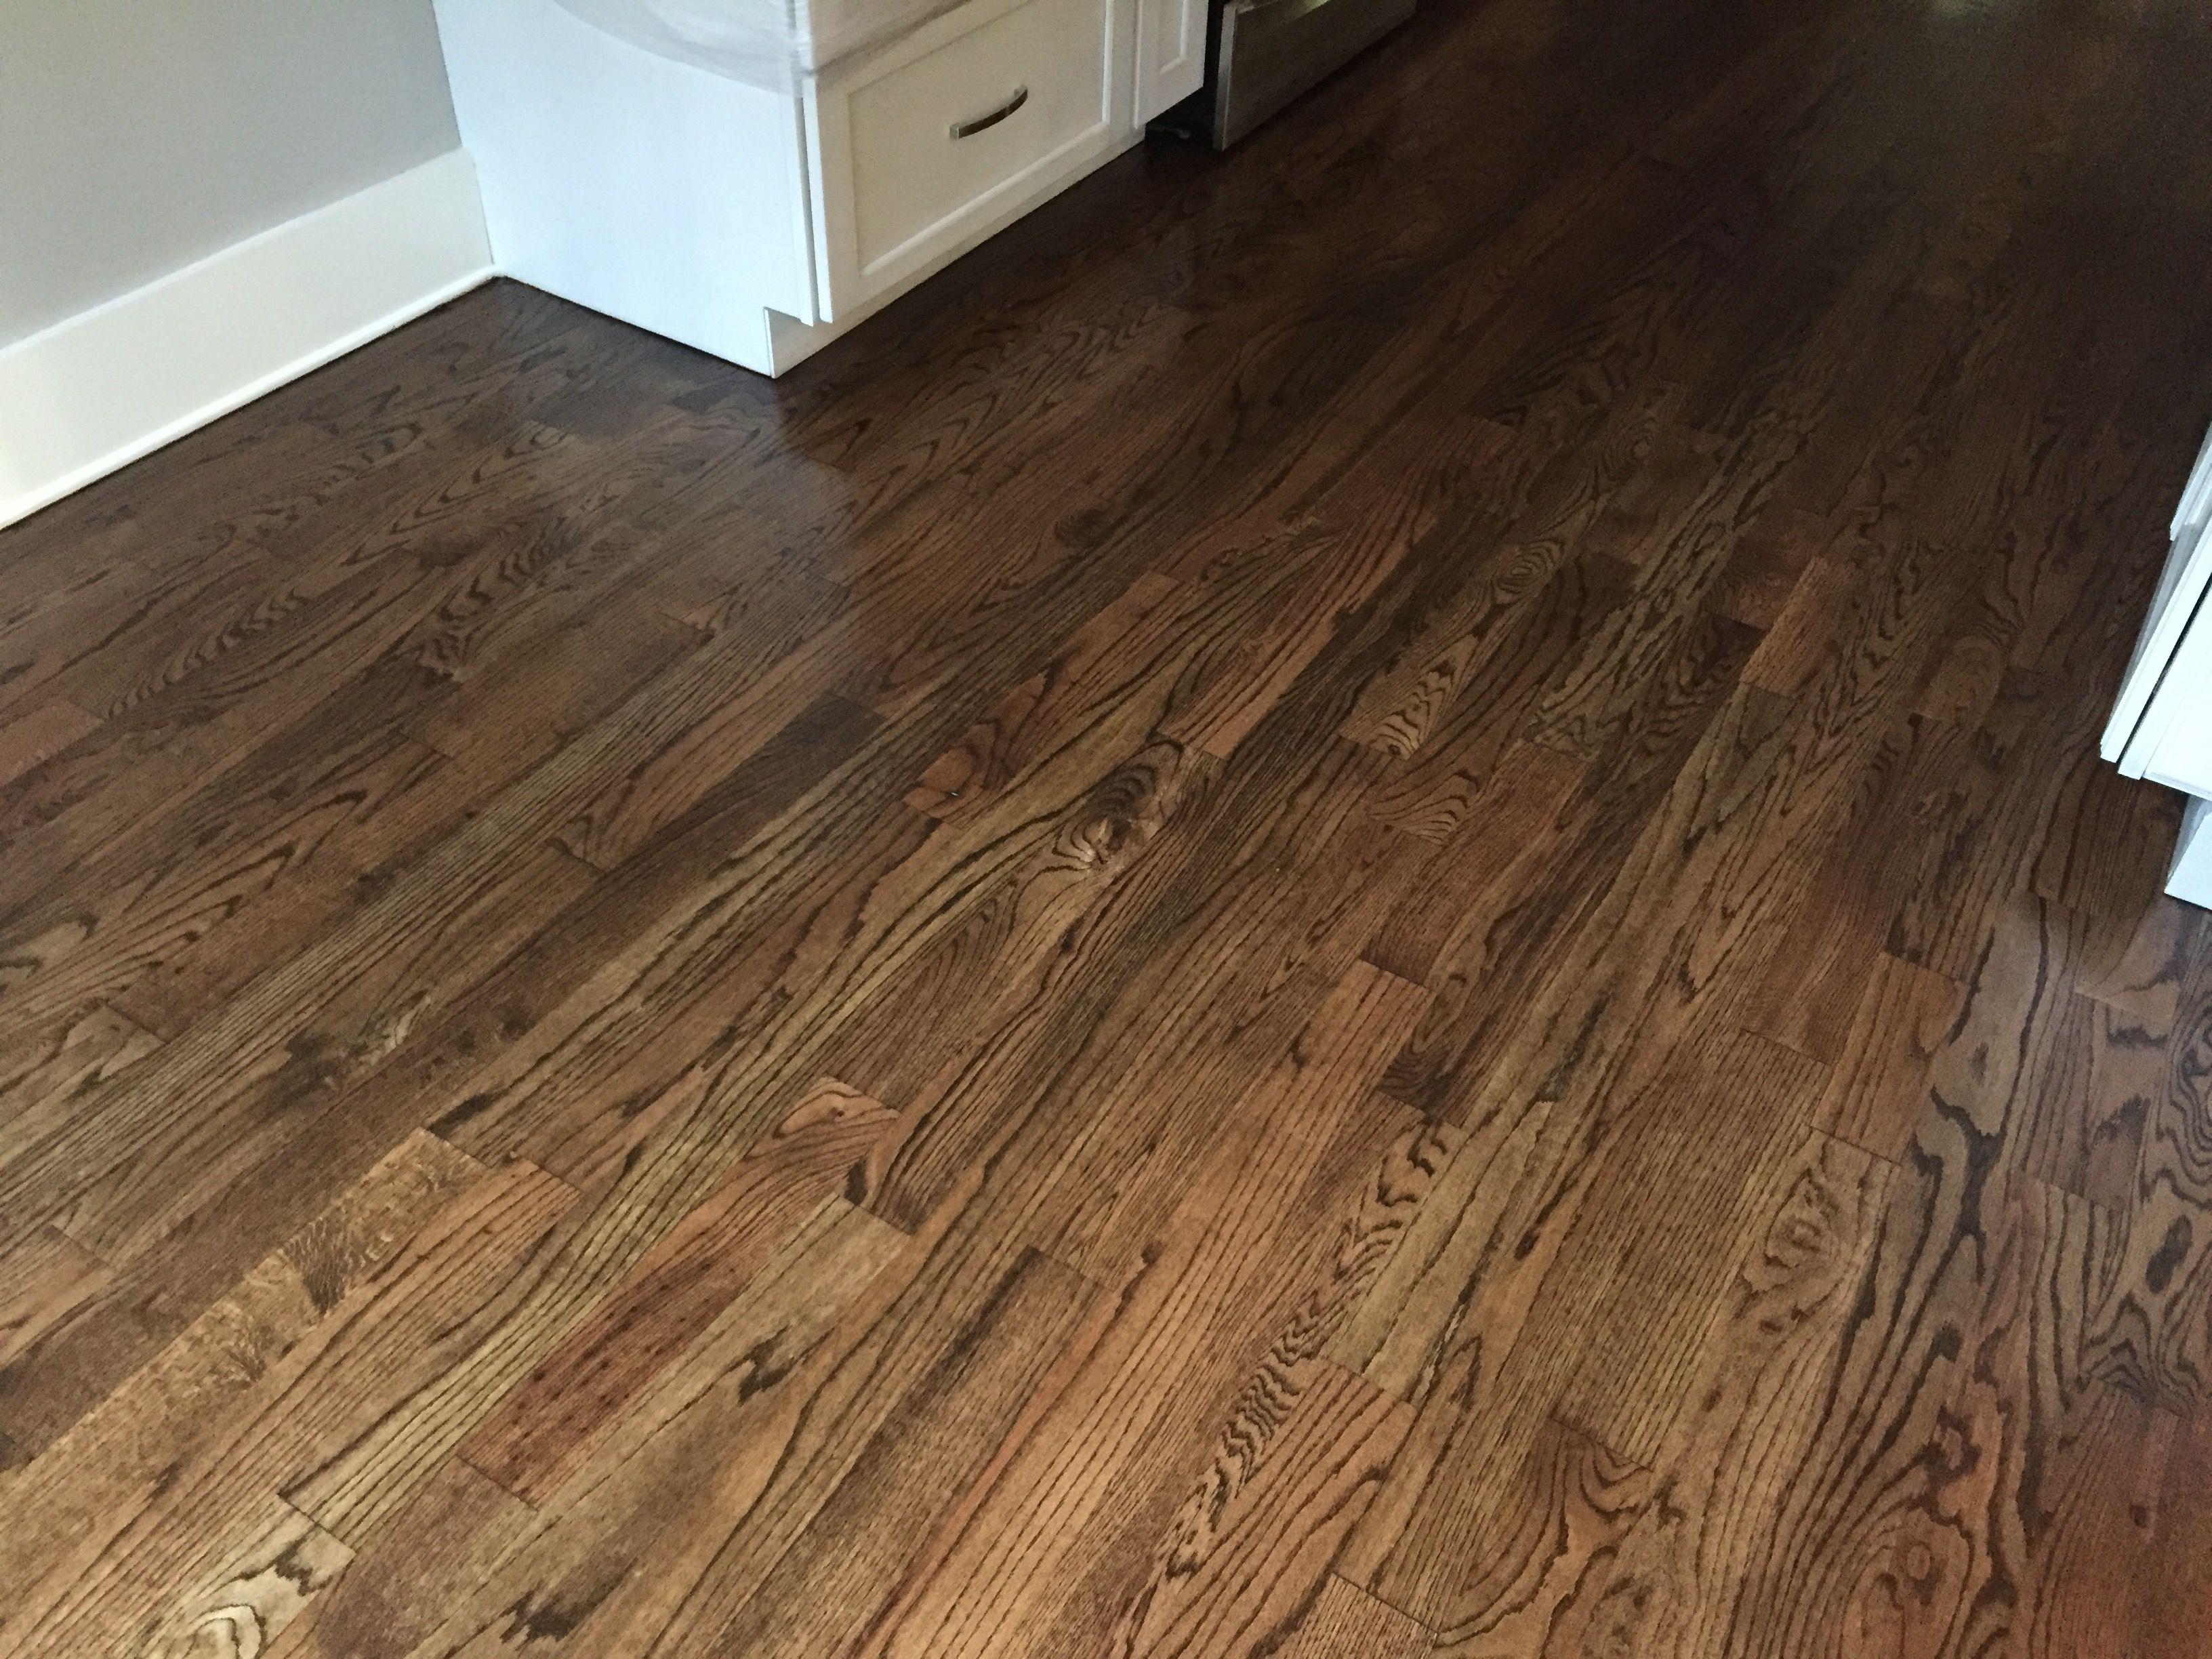 Newly Sanded 2 Red Oak Hardwood Flooring Minwax Espresso Stain